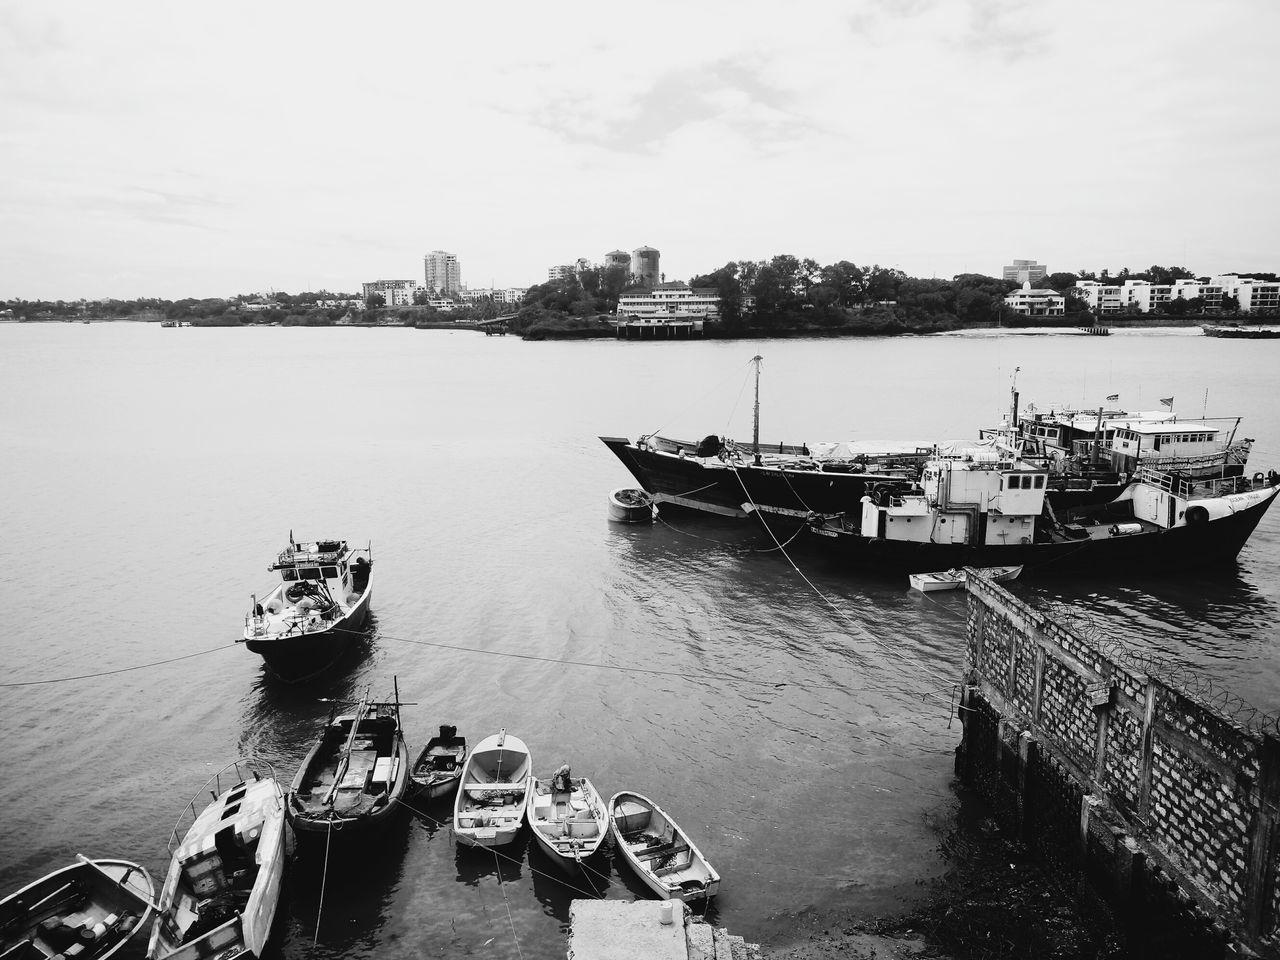 Old Port Mombasa. Nautical Vessel Water Sea Reflection Harbor Sky Moored Tranquility Outdoors Transportation Day KenyanMade Kenya Mombasa Blackandwhite Scenics Horizon Over Water Boats Anchored The Great Outdoors - 2017 EyeEm Awards EyeEmNewHere